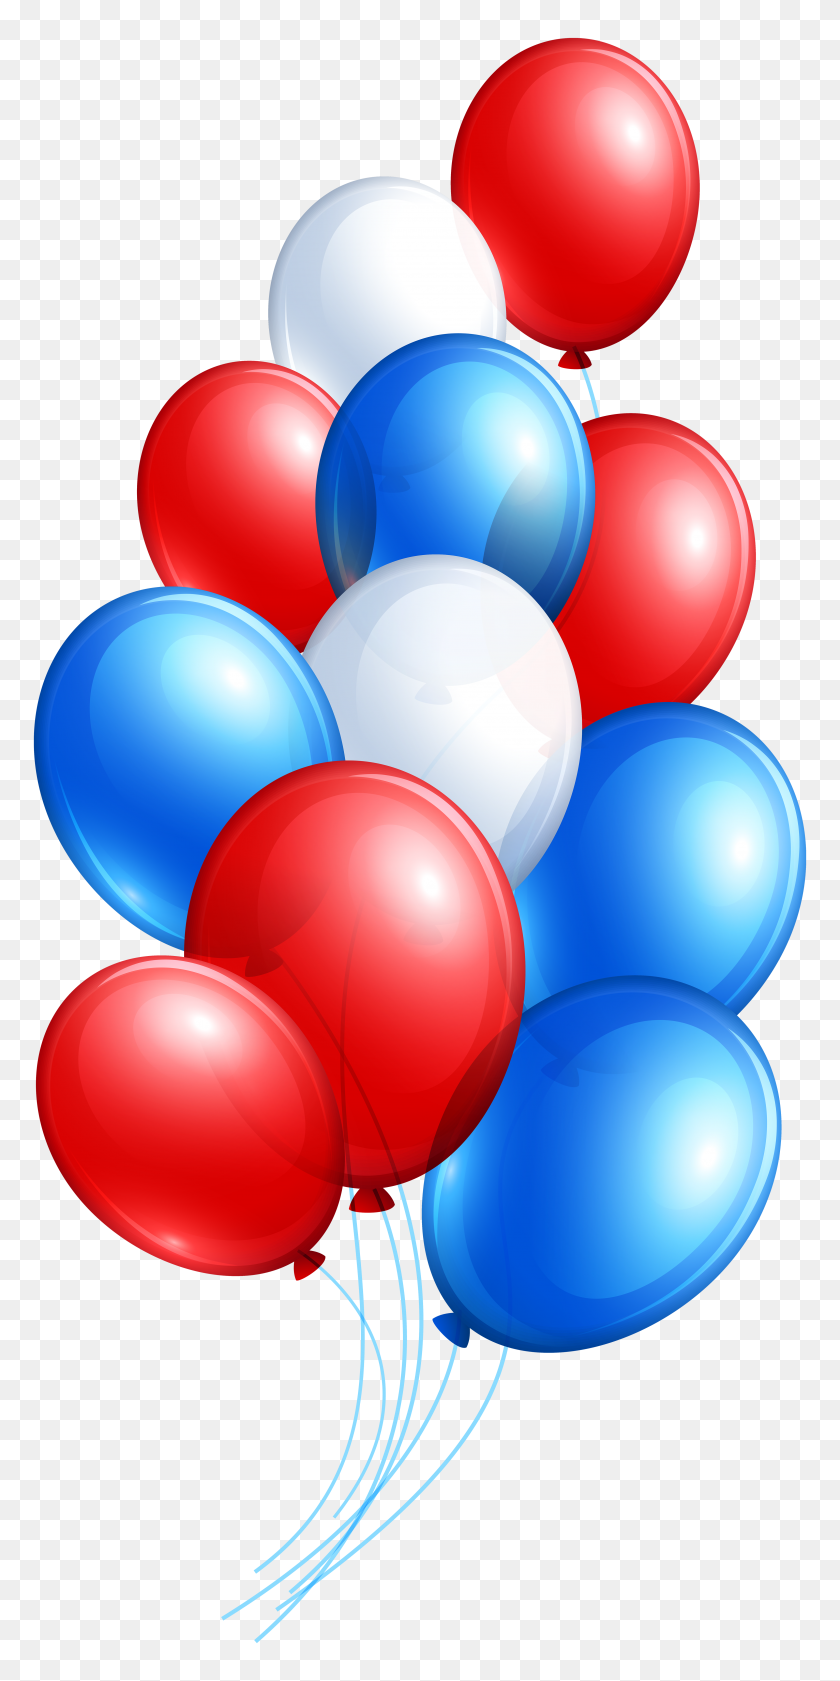 3848x8000 July Balloon Bunch Png Clip Art - Up Balloons Clipart